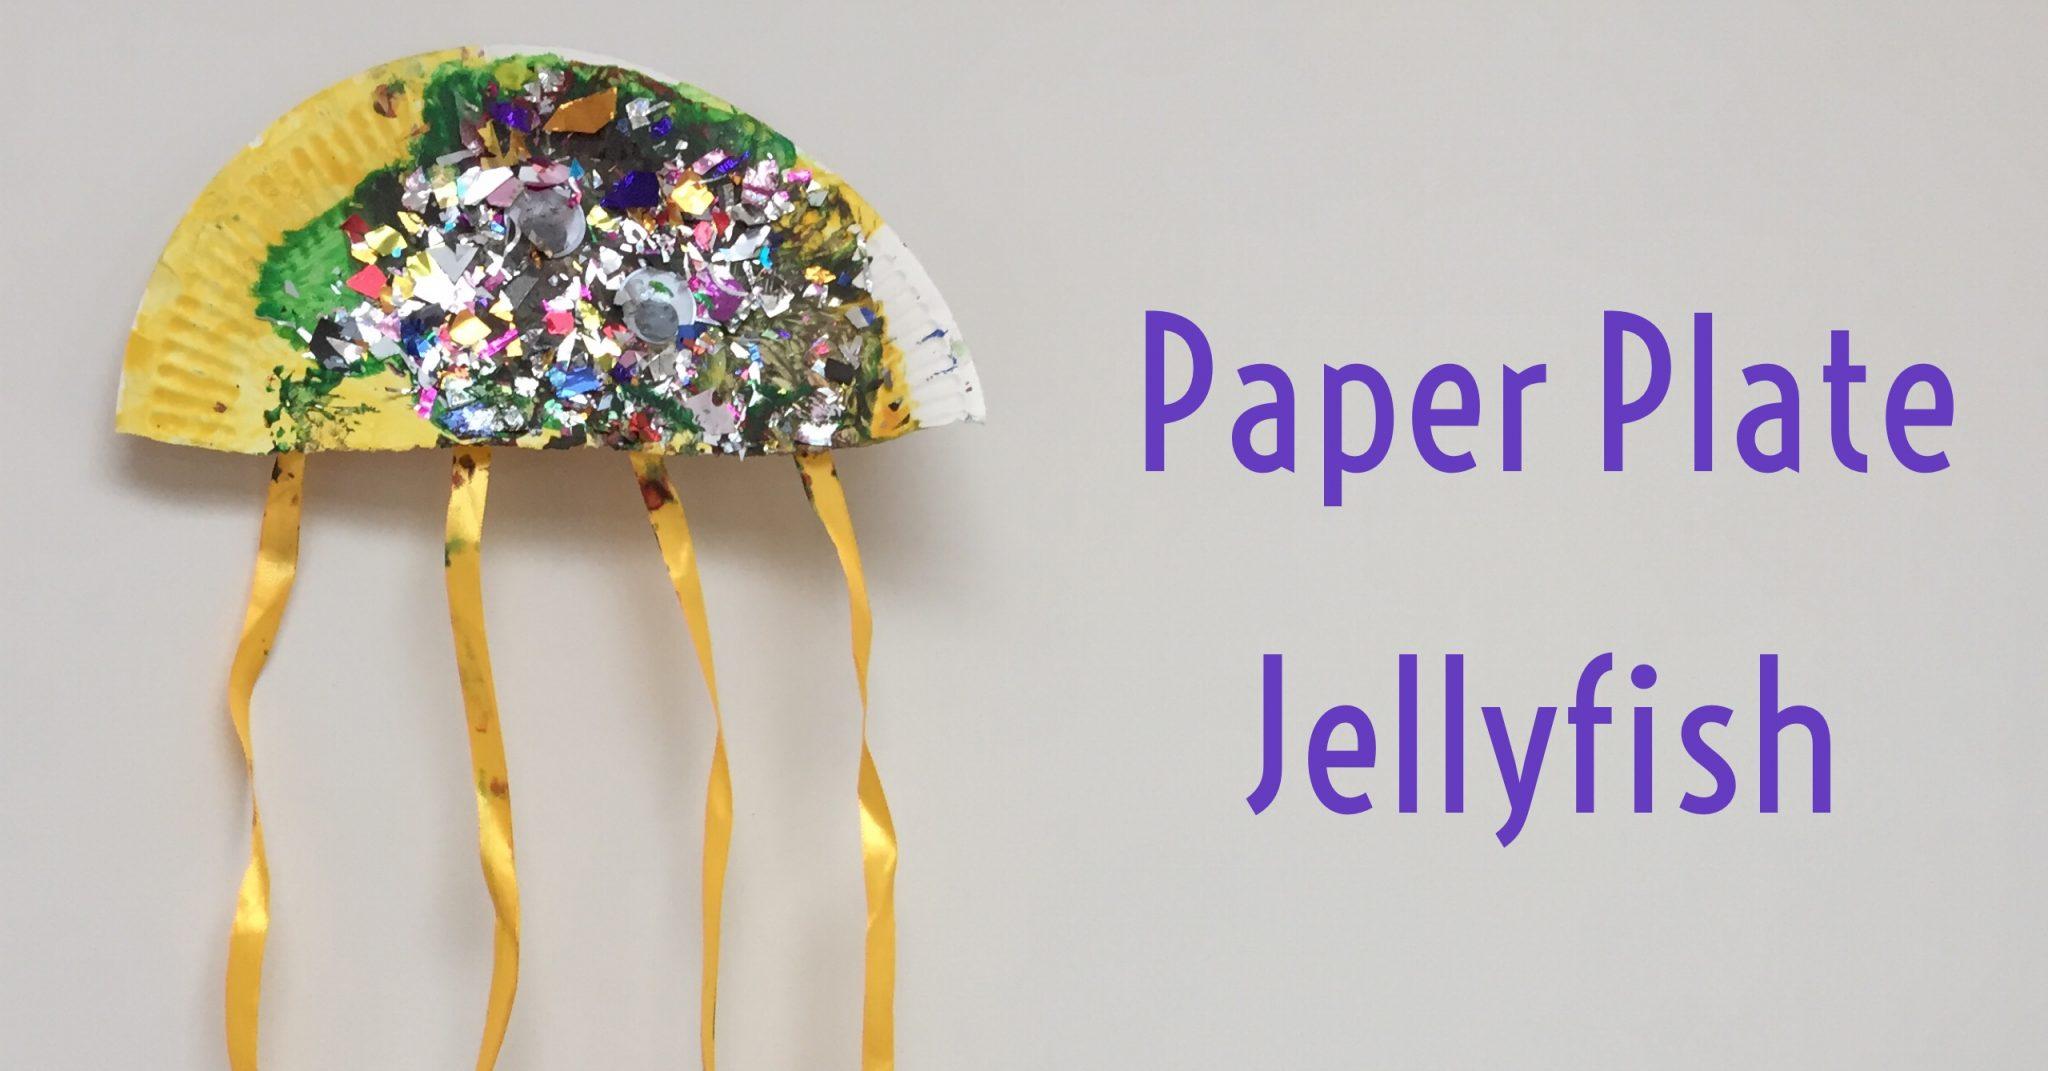 Paper Plate Jellyfish - Red Kite Days